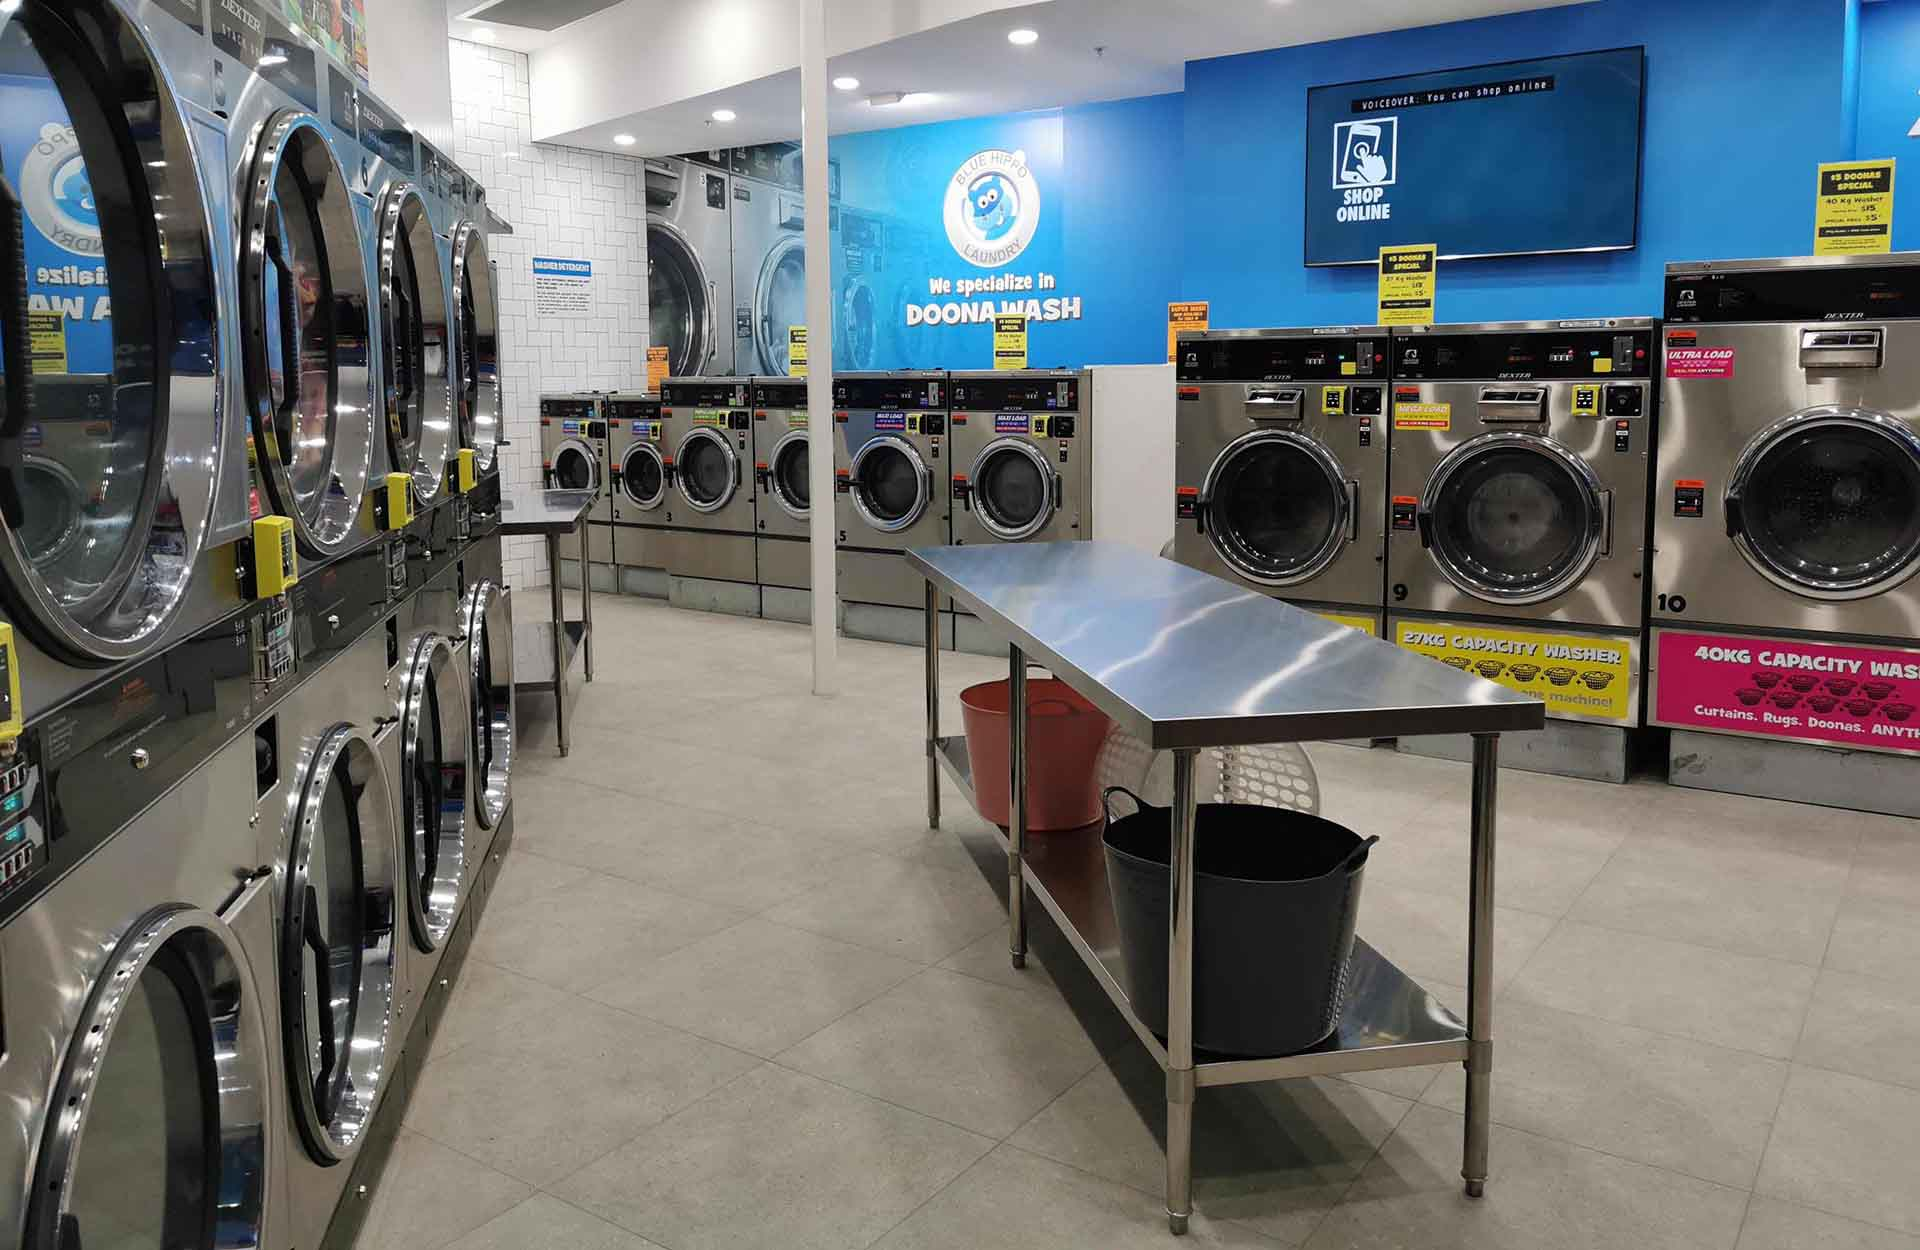 40KG Washing Machines Melbourne